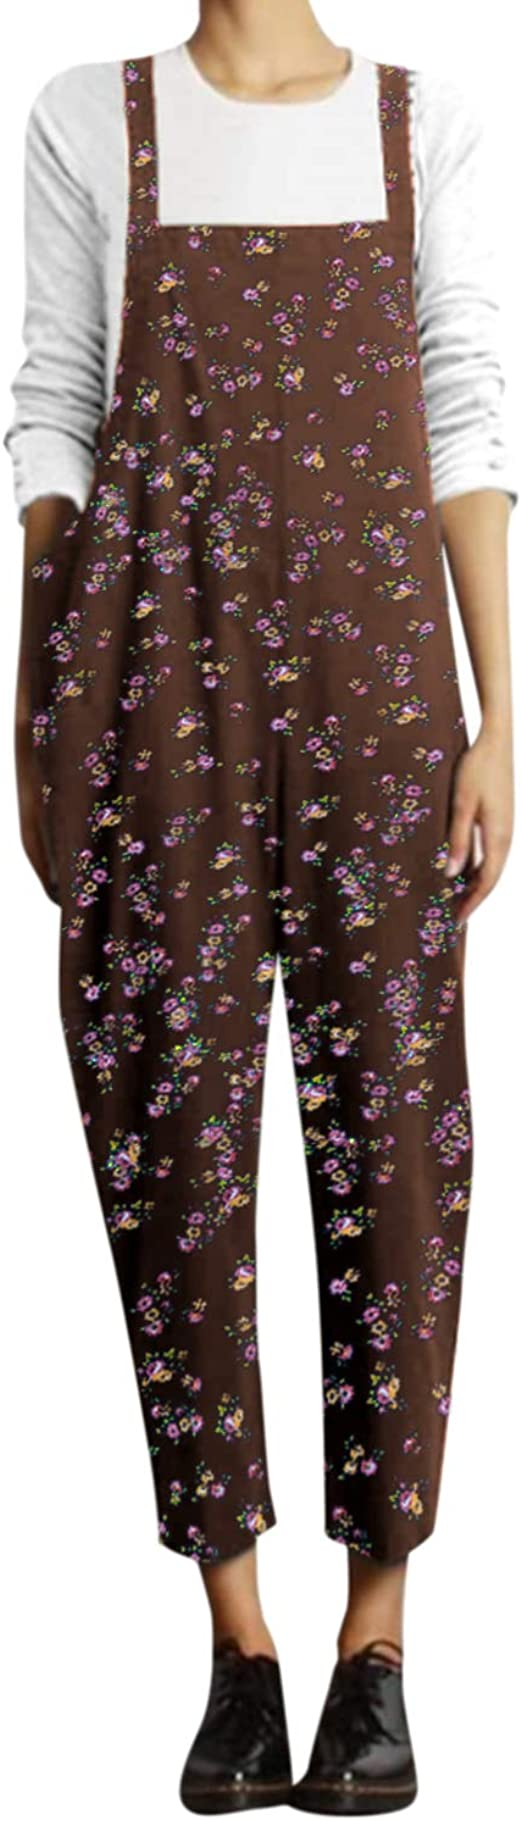 VONDA Jumpsuit Damen Elegant Overall Lang Latzhose Einteiler /Ärmellos Casual Lose Hosenanzug Romper Blumenmuster Playsuit G-Blau XL